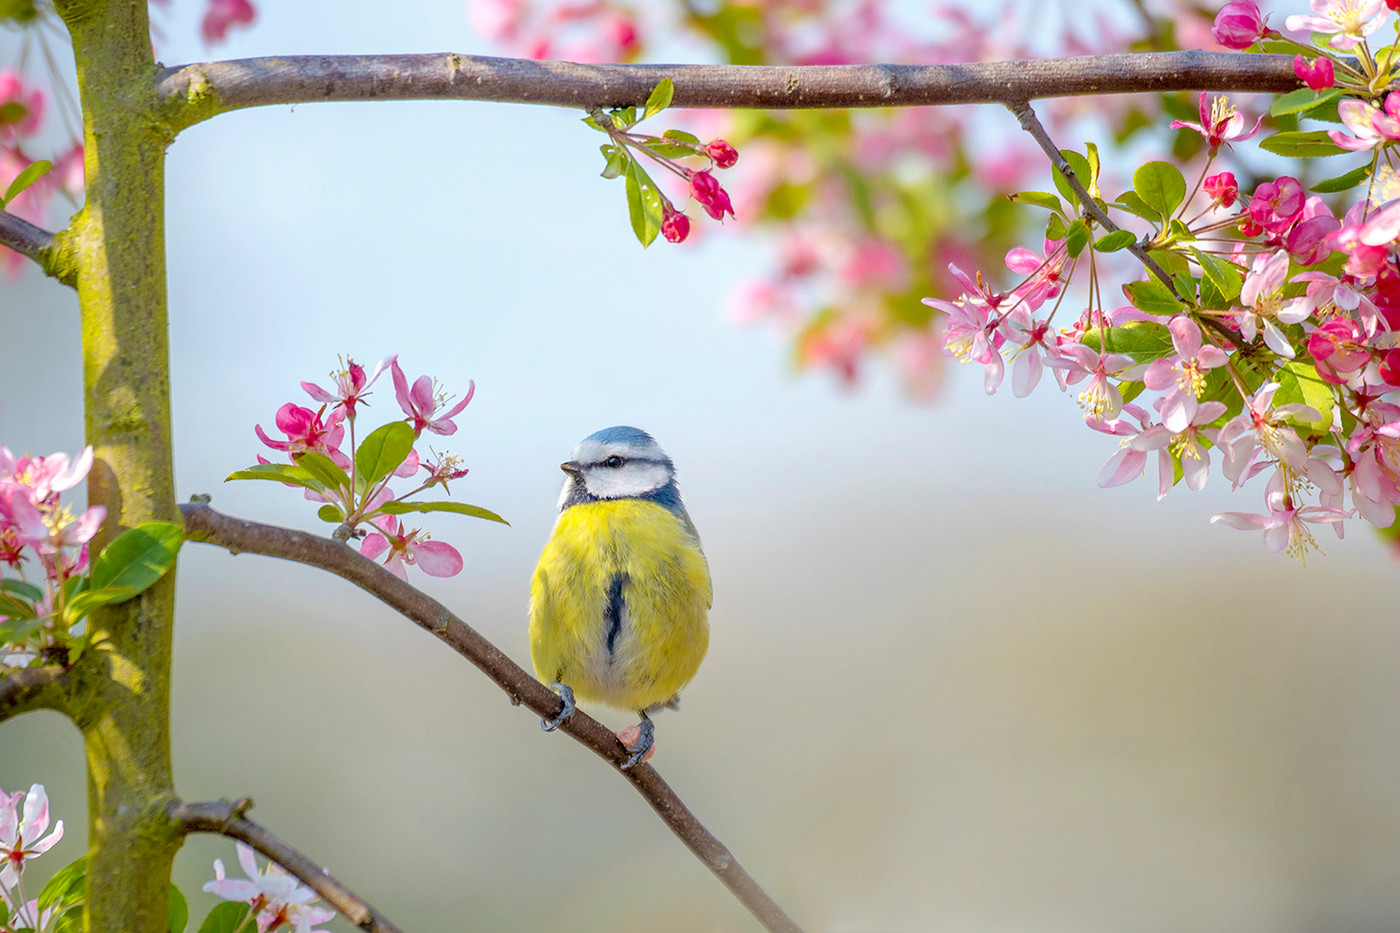 Blue tit in spring